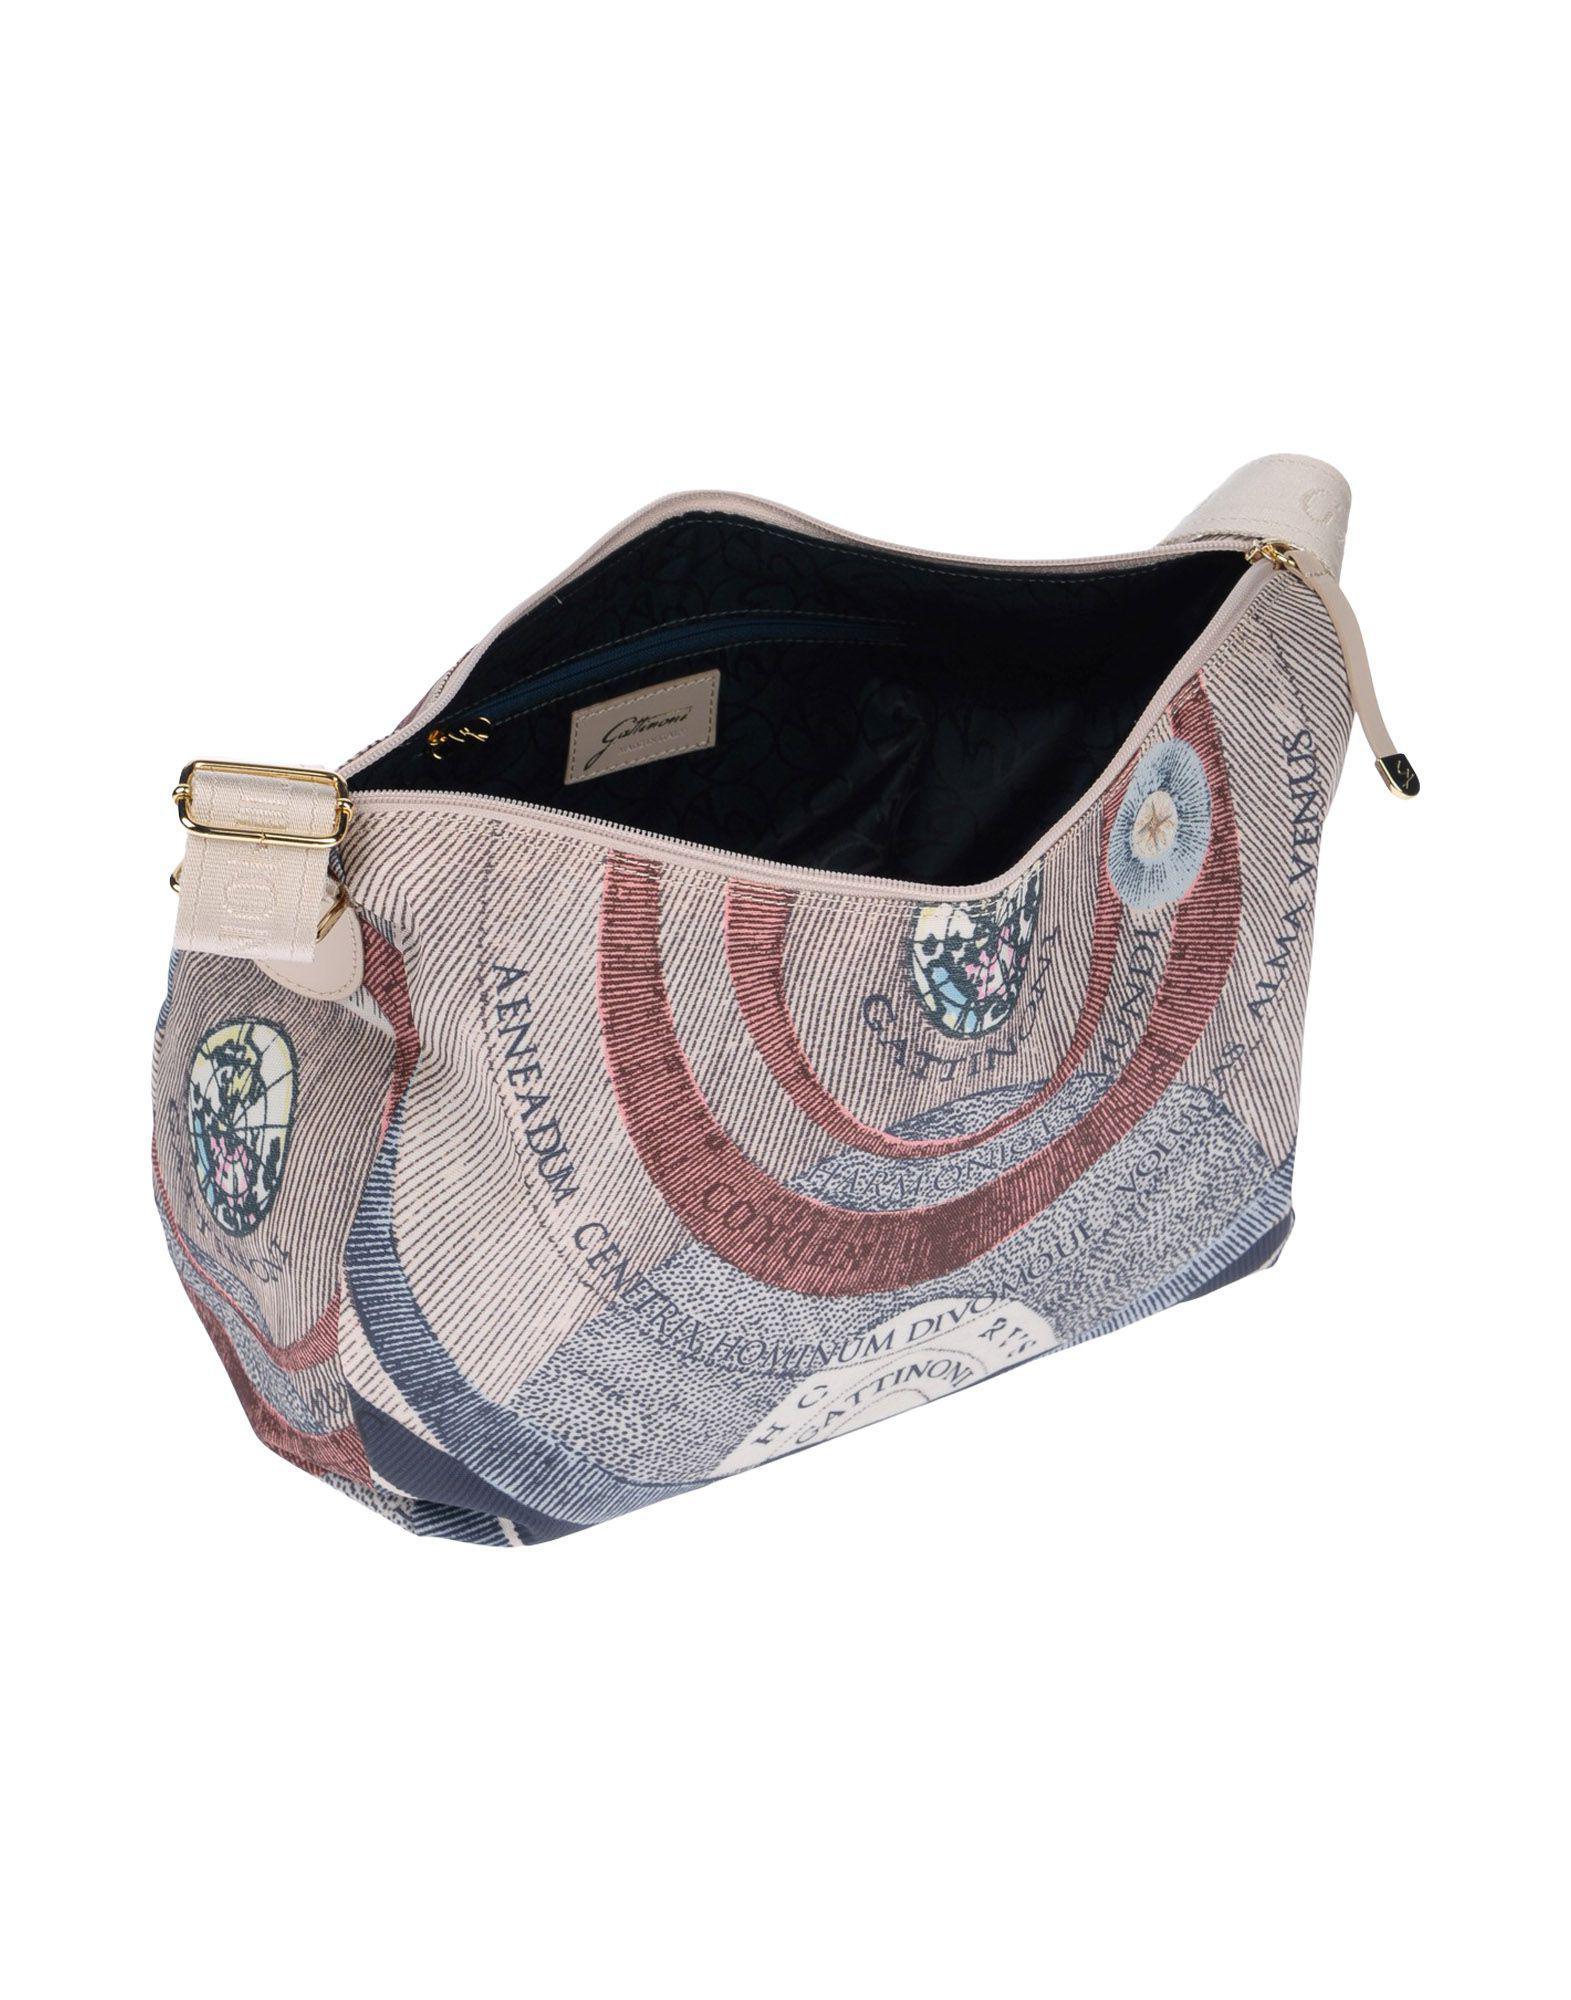 Gattinoni Synthetic Cross-body Bag in Beige (Natural)